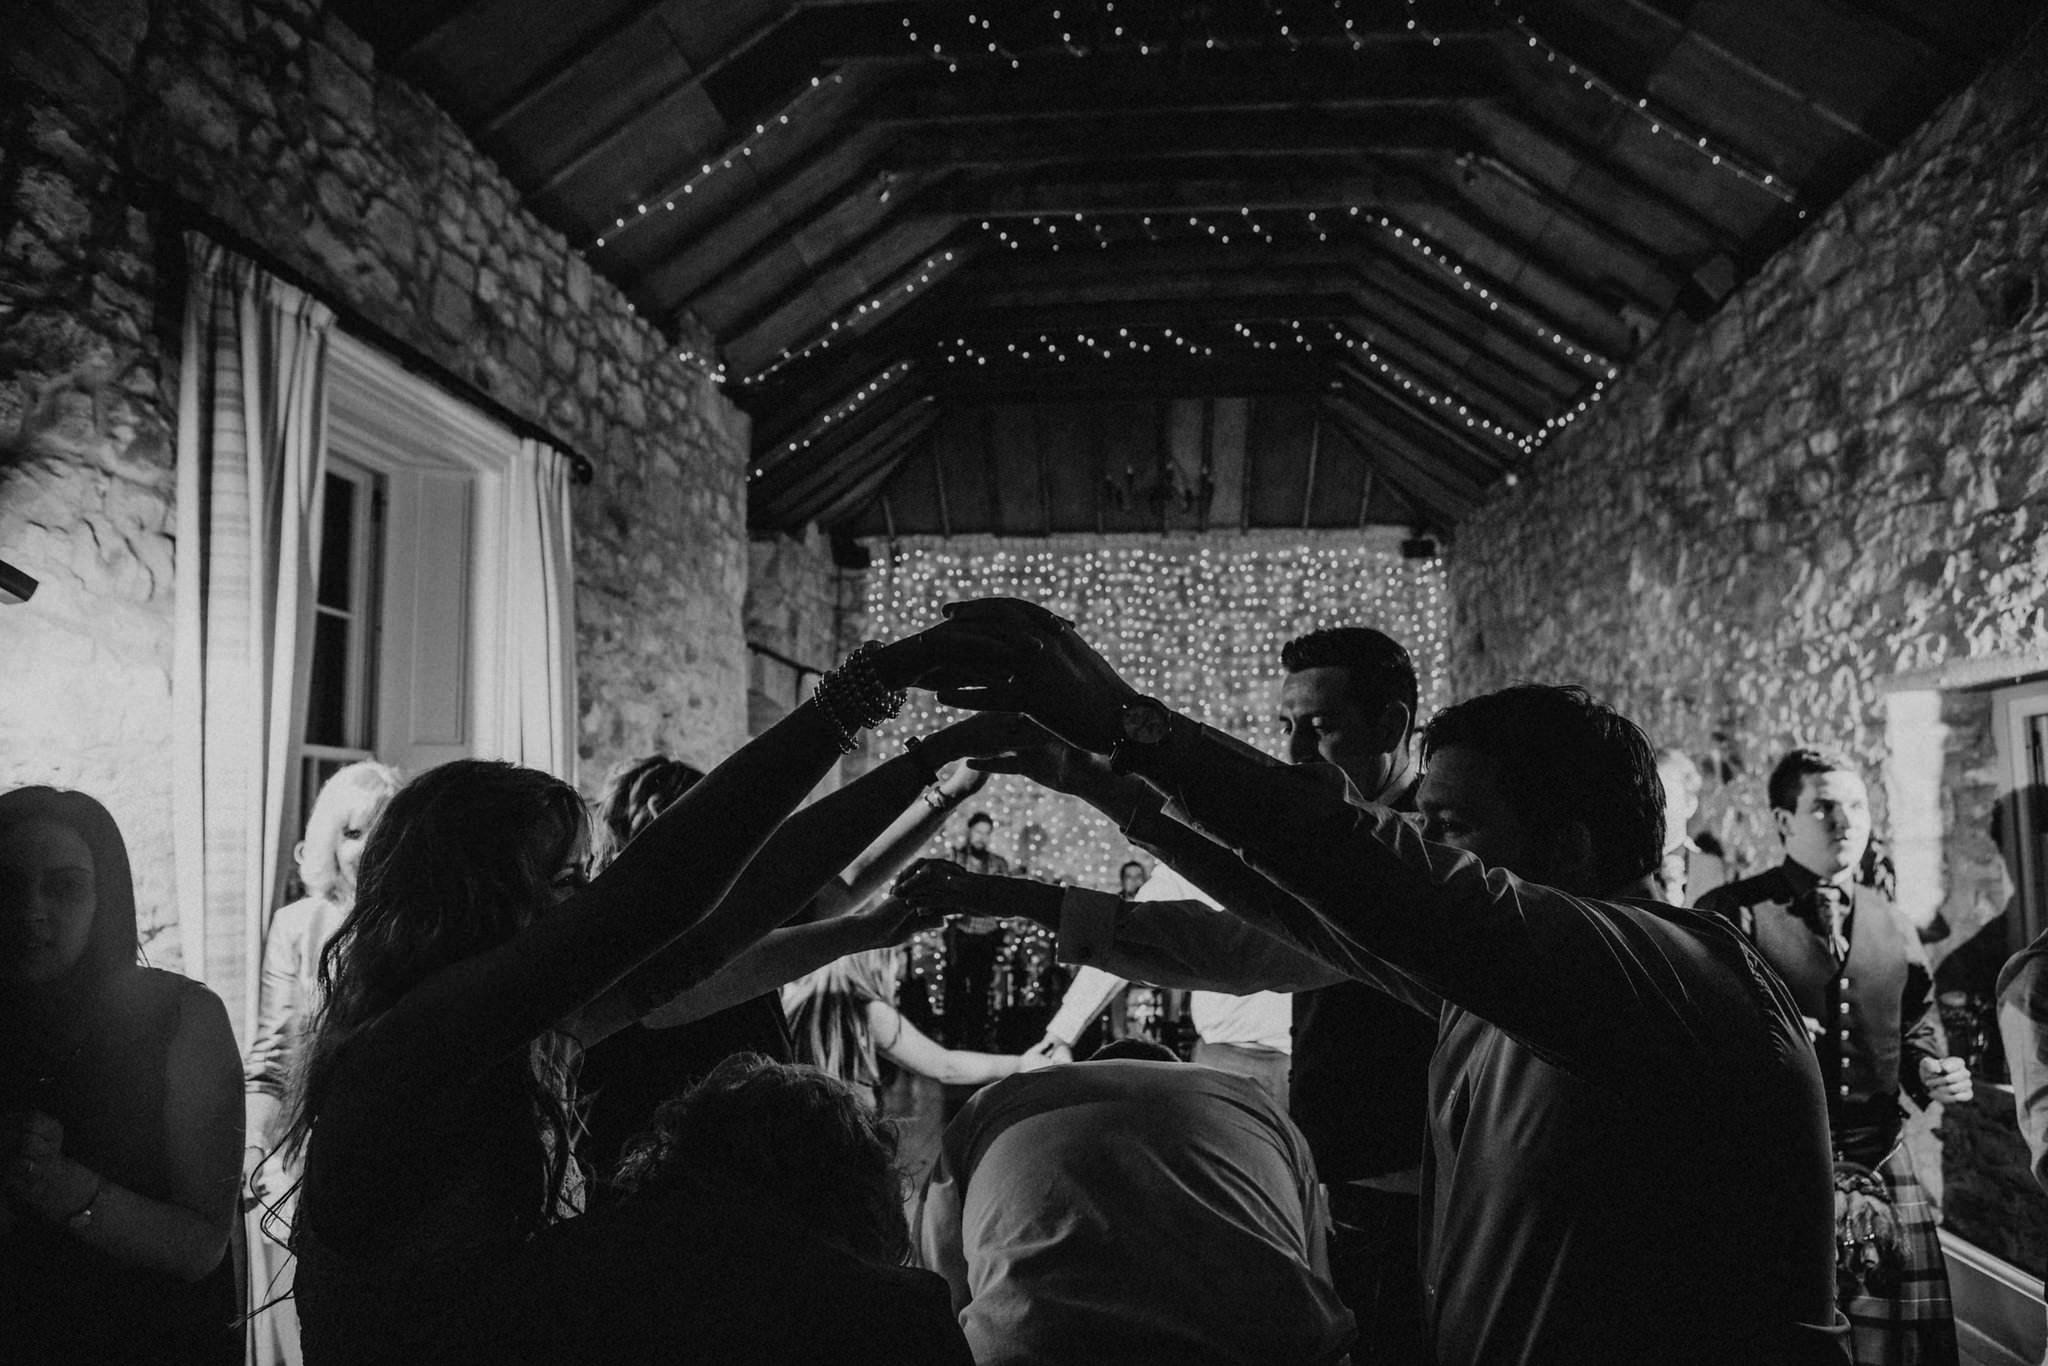 kirknewton stables wedding photographer (89).jpg